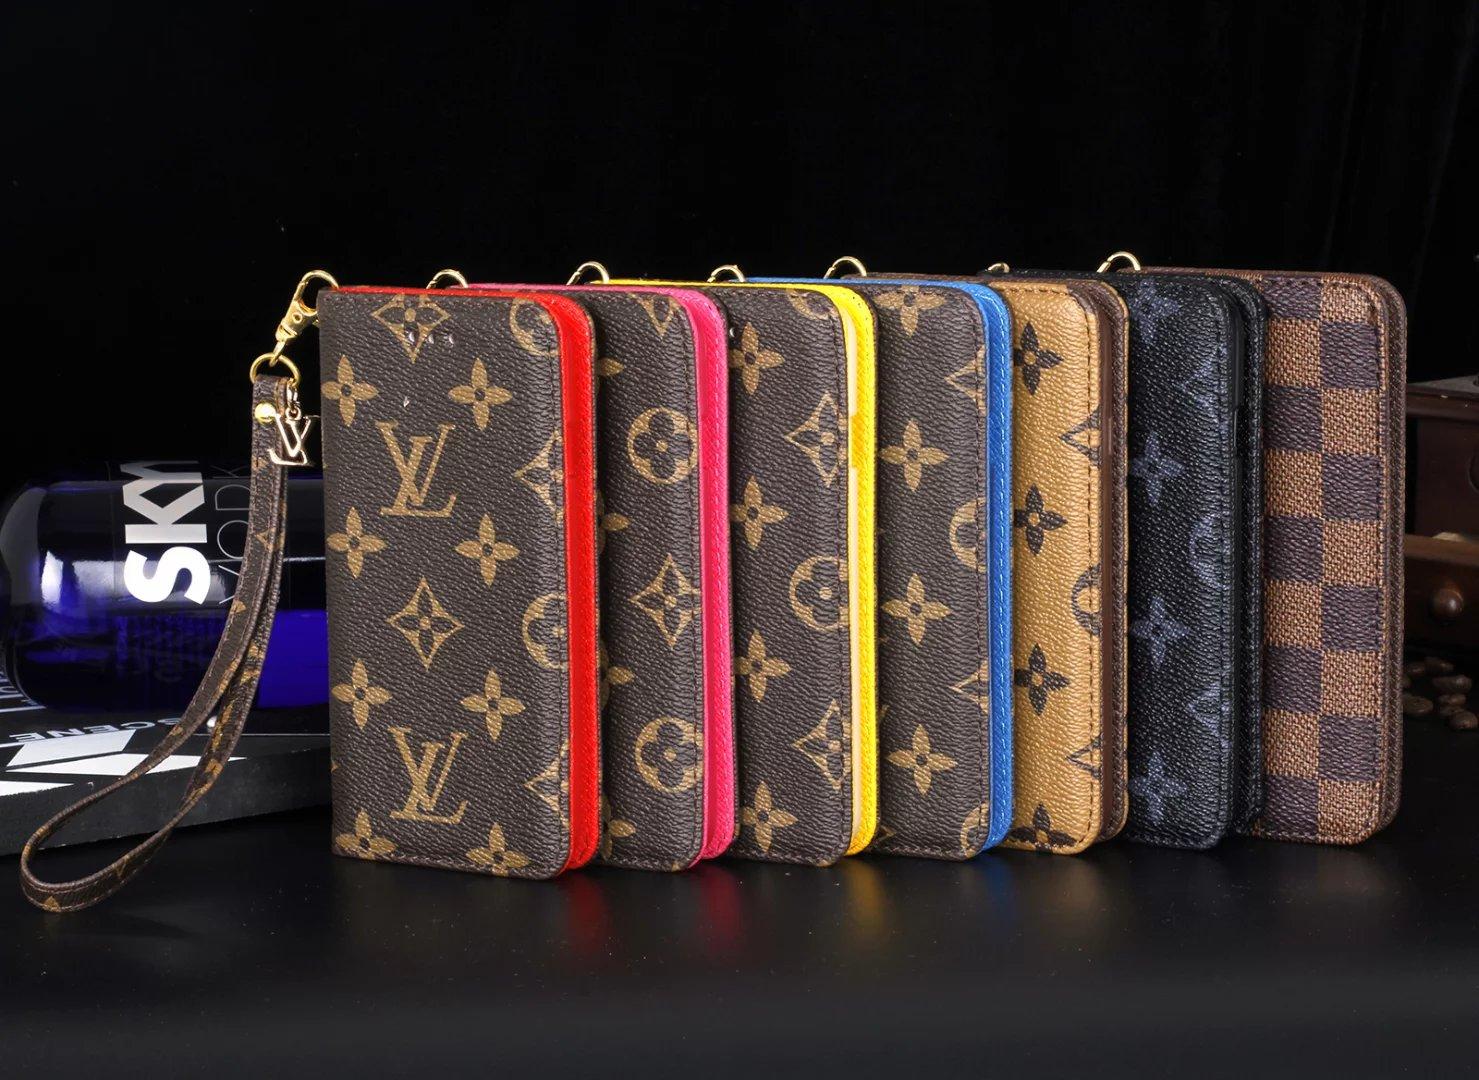 handy hülle iphone iphone case erstellen Louis Vuitton iphone6 plus hülle silikon iphone 6 Plus hülle iphone 6 Plus etui iphone schutzhülle handycover 6lbst gestalten samsung iphone hülle laufen iphone 6 Plus s hülle